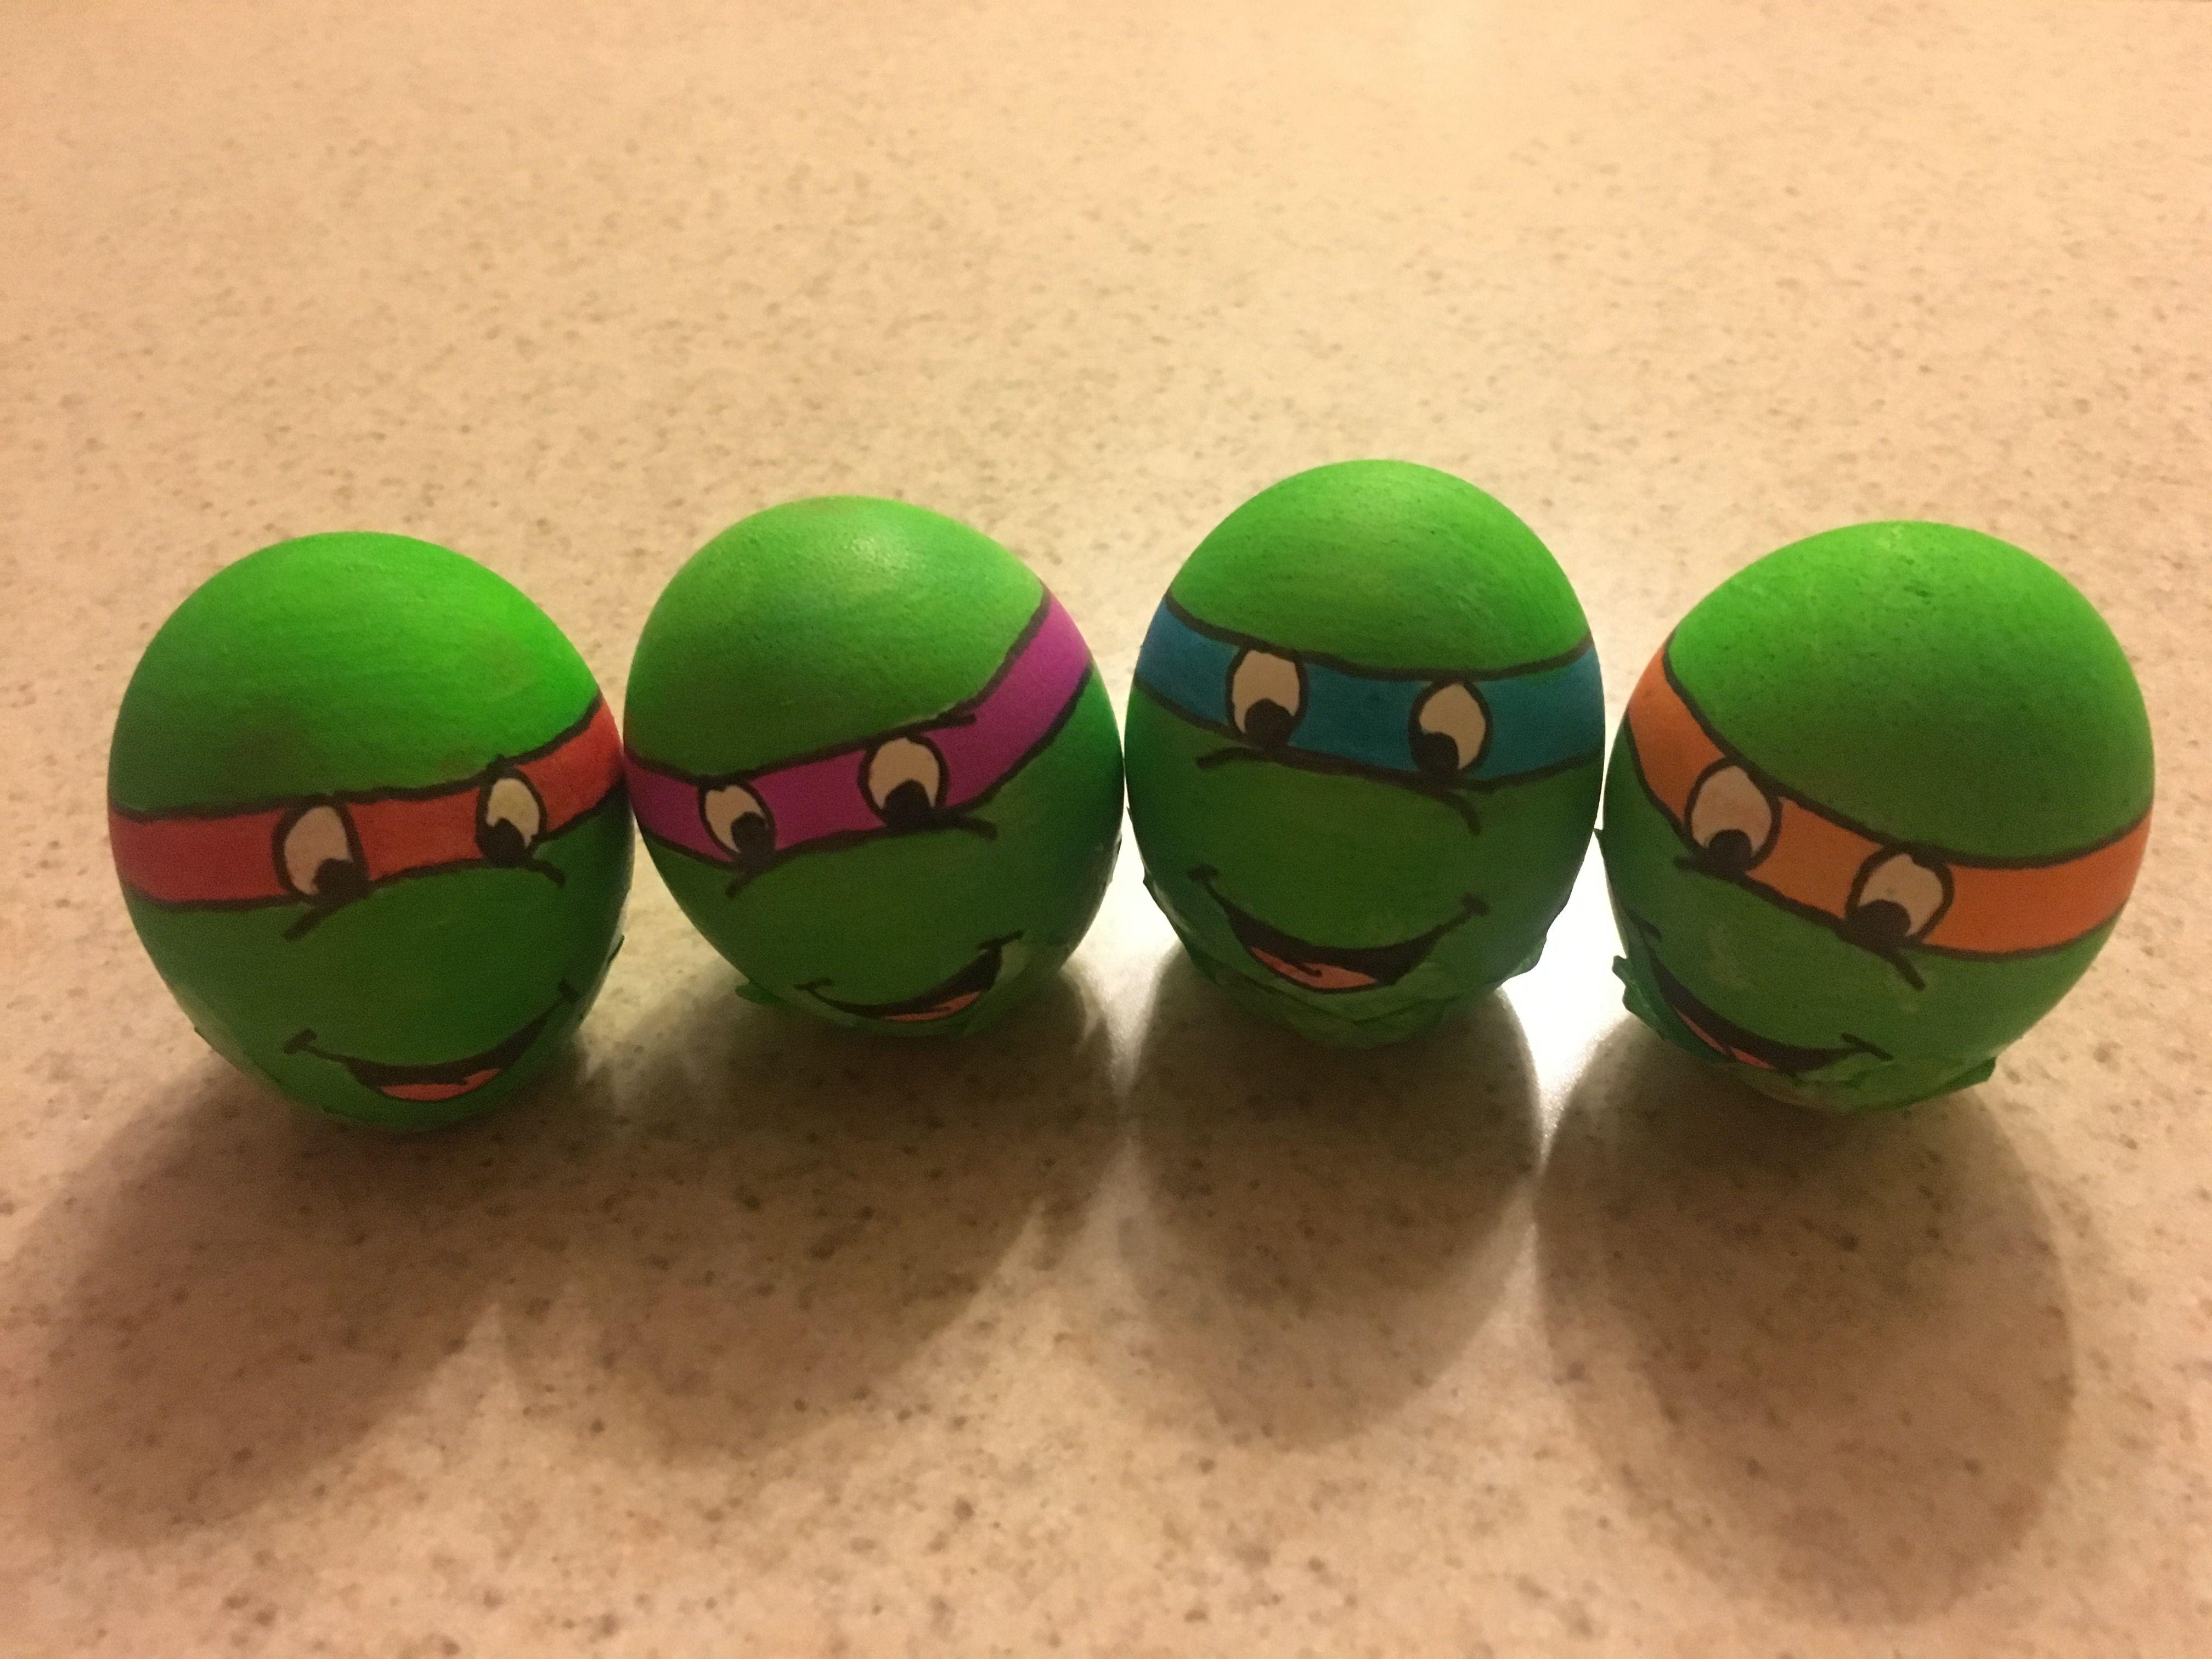 Easter Eggs Turtle Ninja Huevos De Pascua Huevos De Confeti Pascua